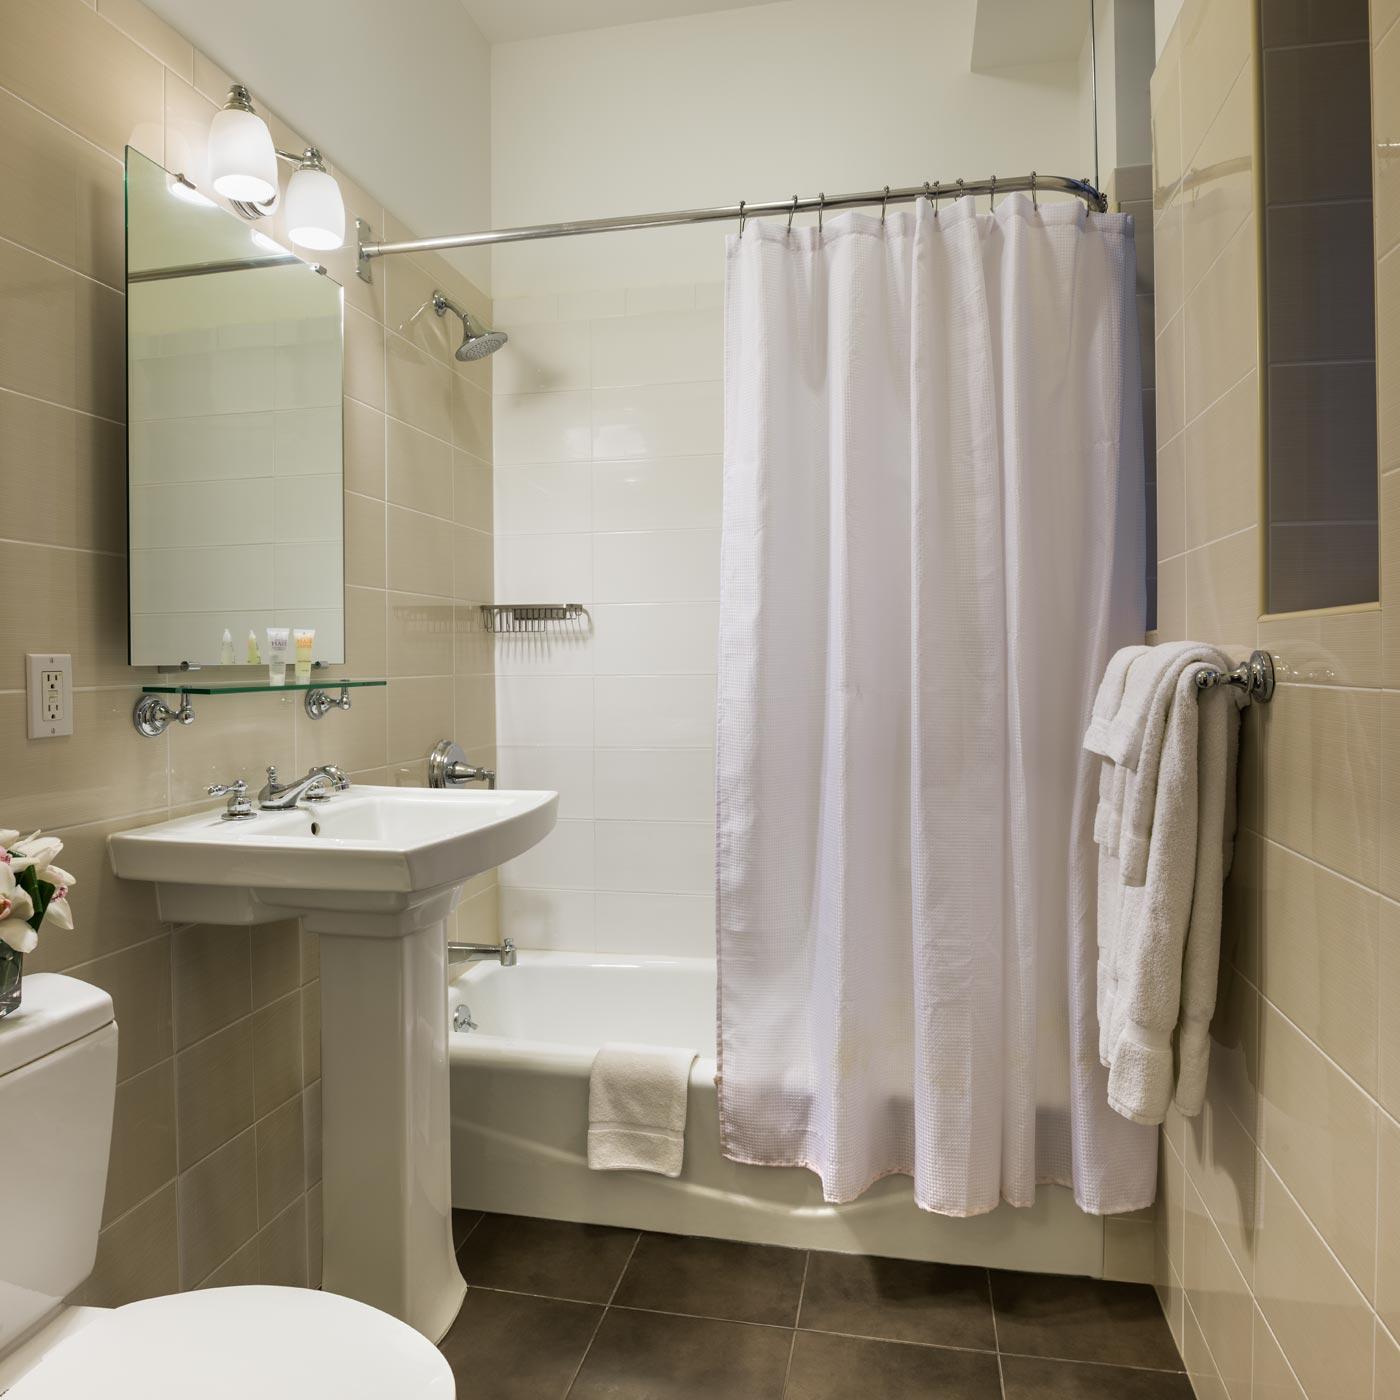 Shared-Bath Economy Gallery   Seton Hotel